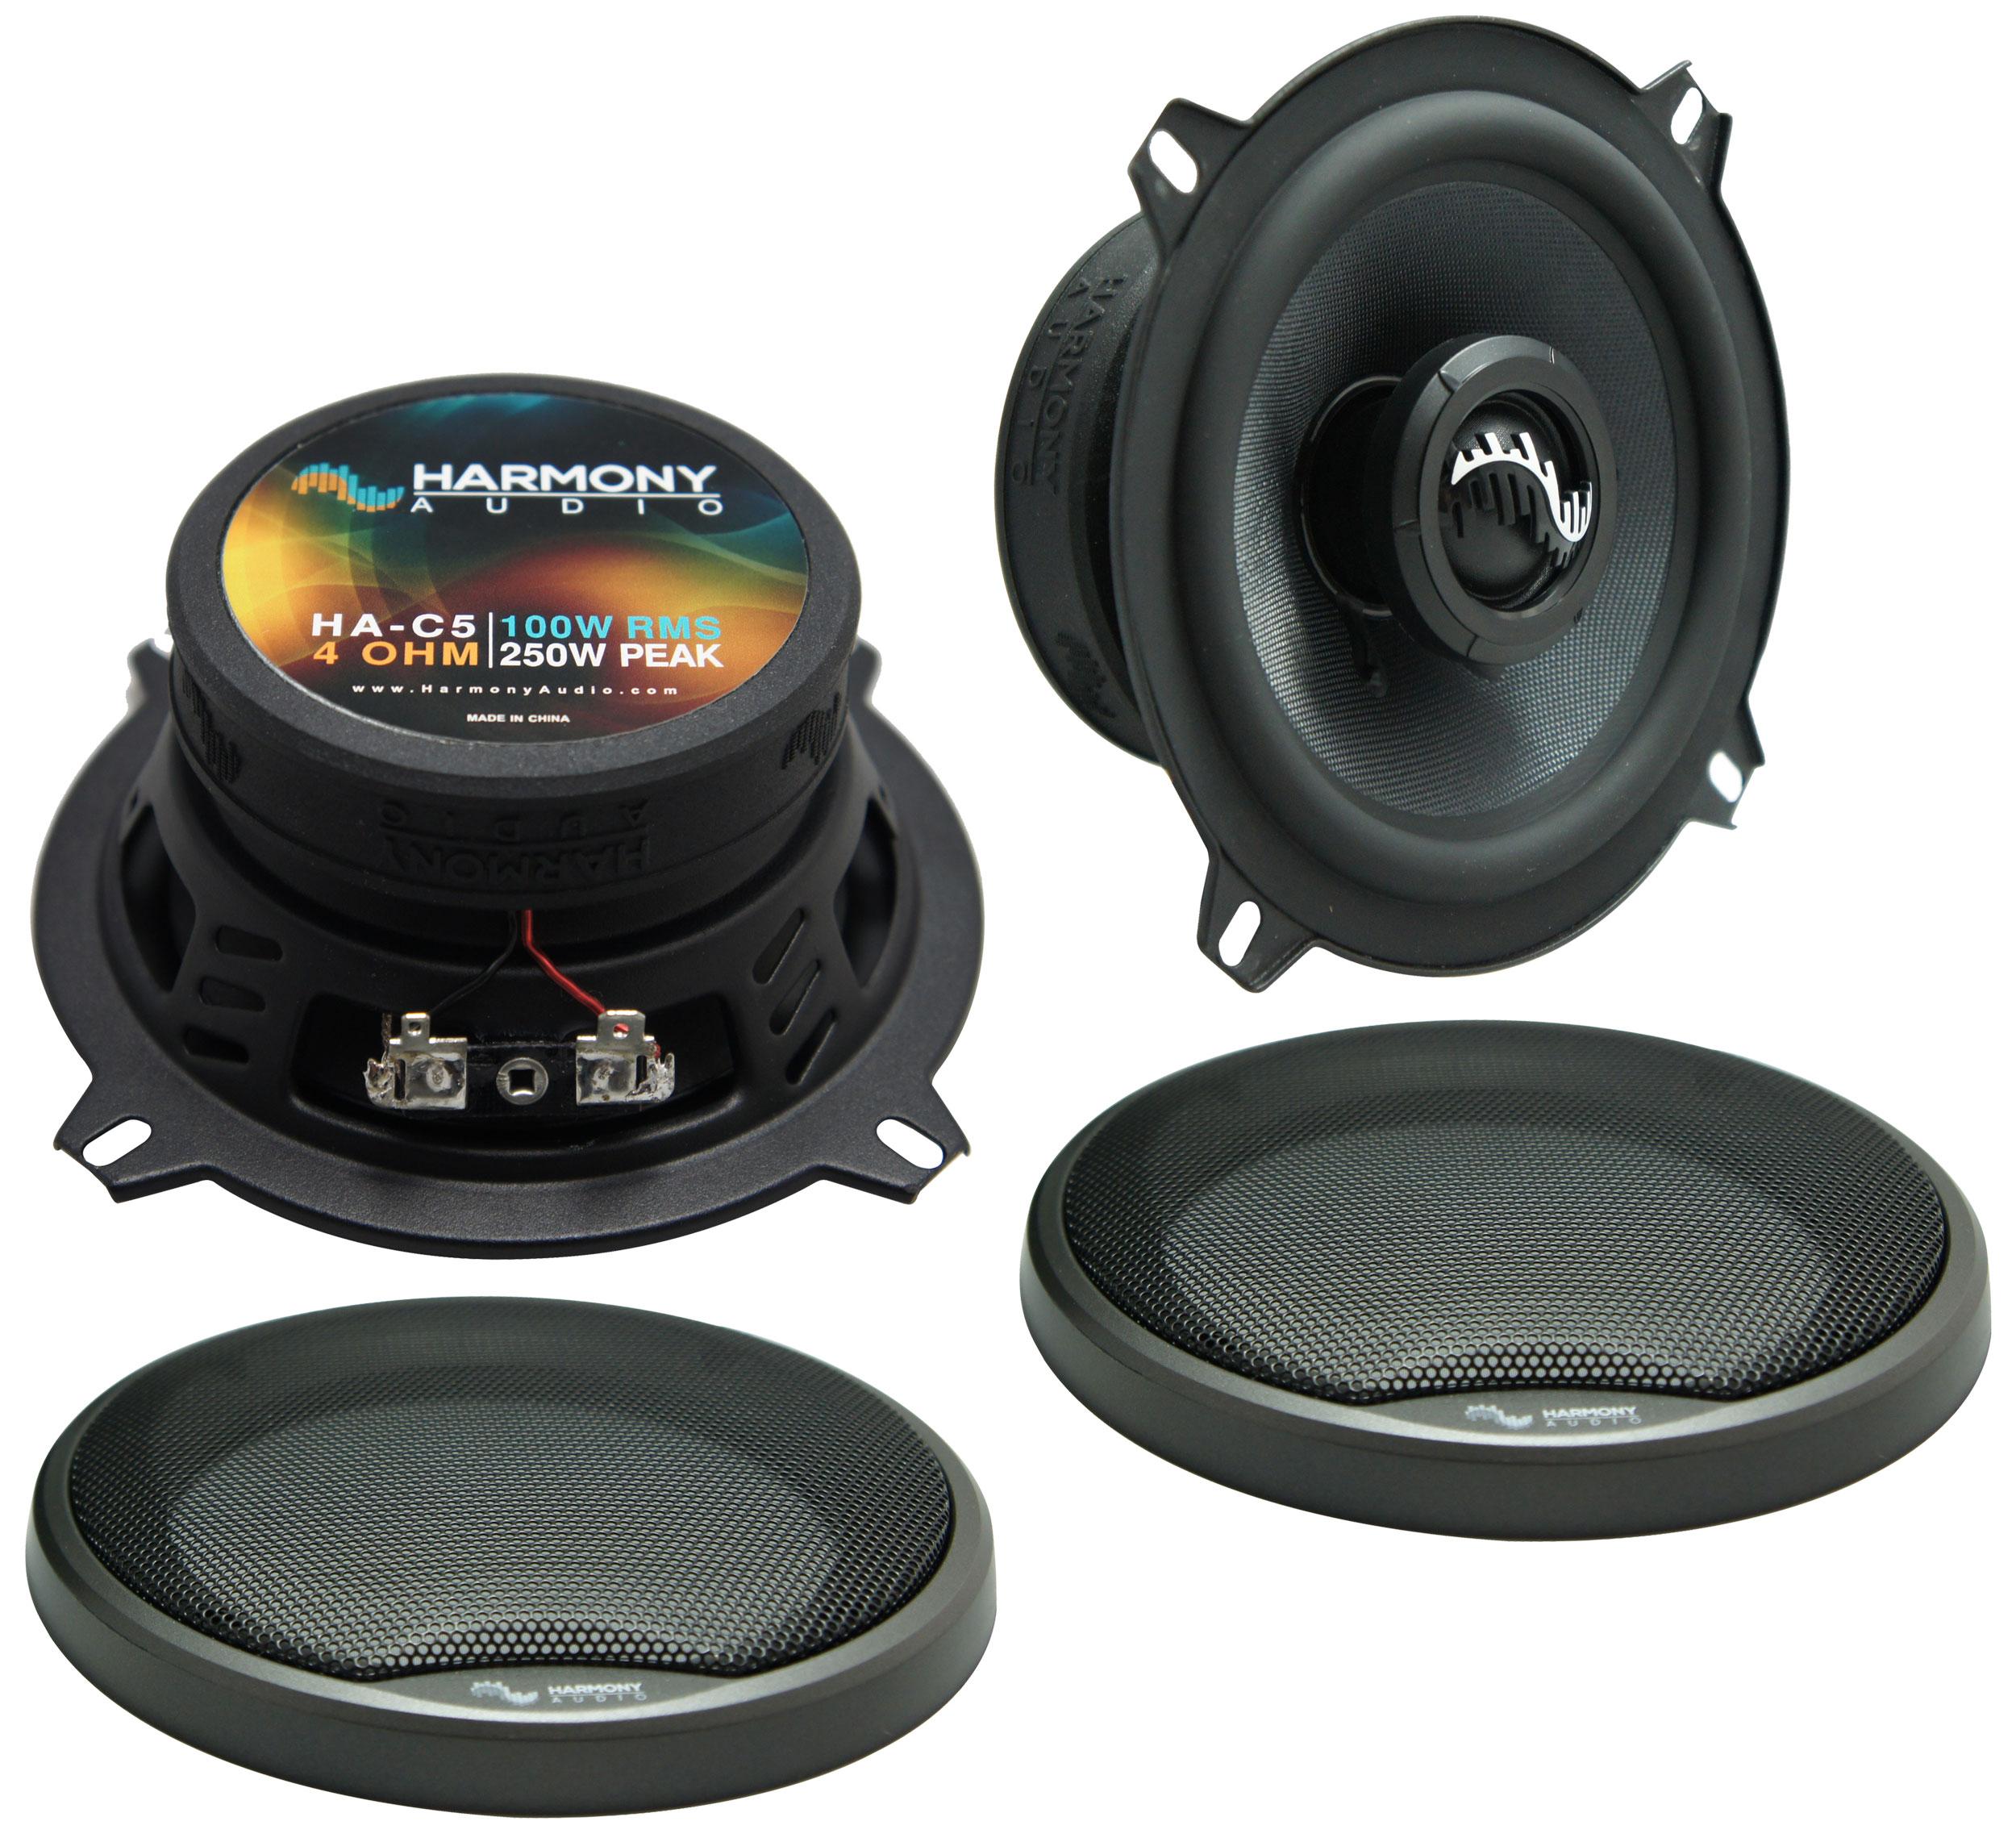 Fits Cadillac Escalade 2007-2014 Rear Door Replacement Harmony HA-C5 Premium Speakers